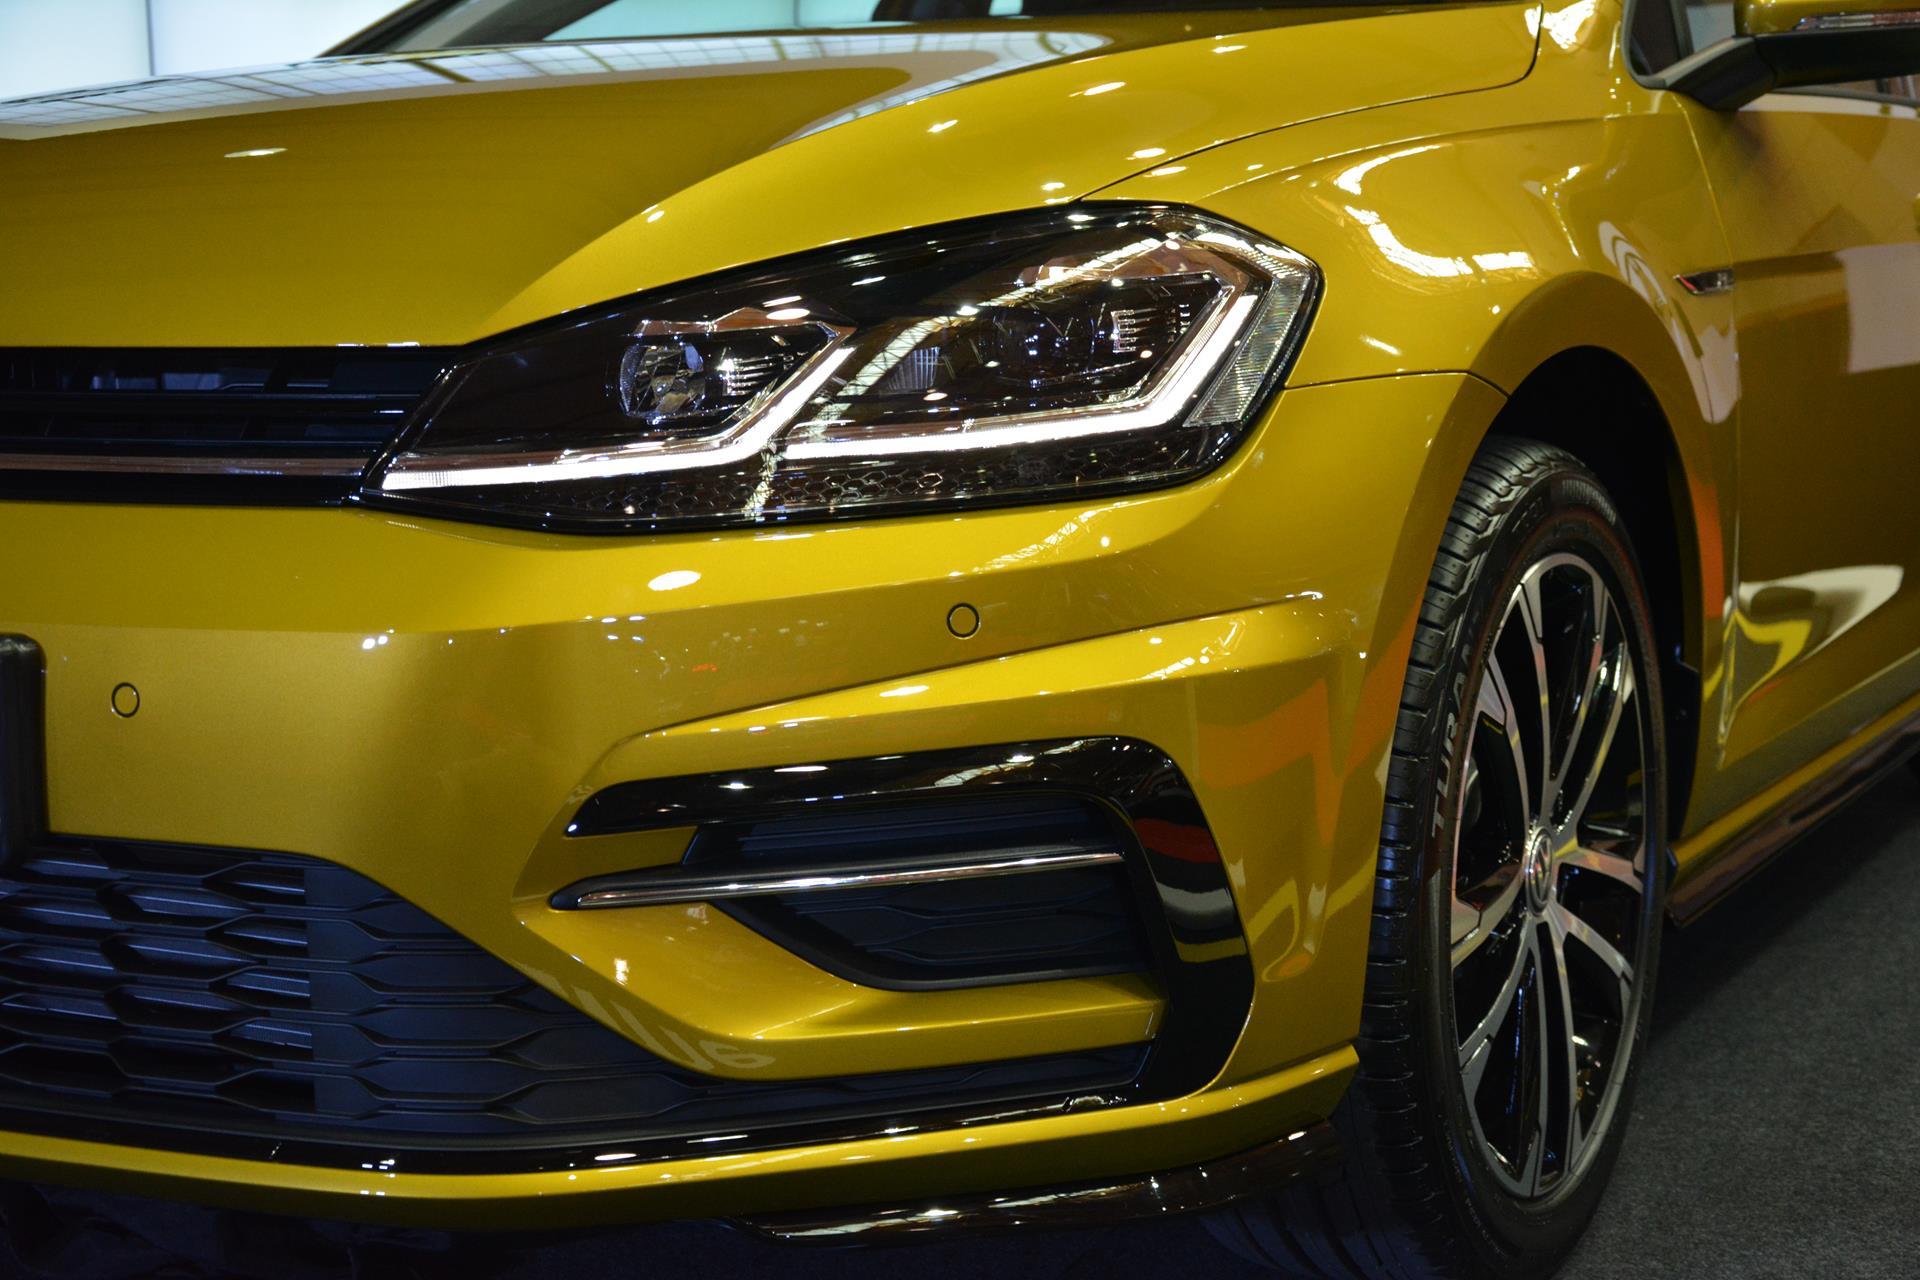 Golf VII Sport - Spoiler neri lucidi Volkswagen_golf_r-line_debut-3